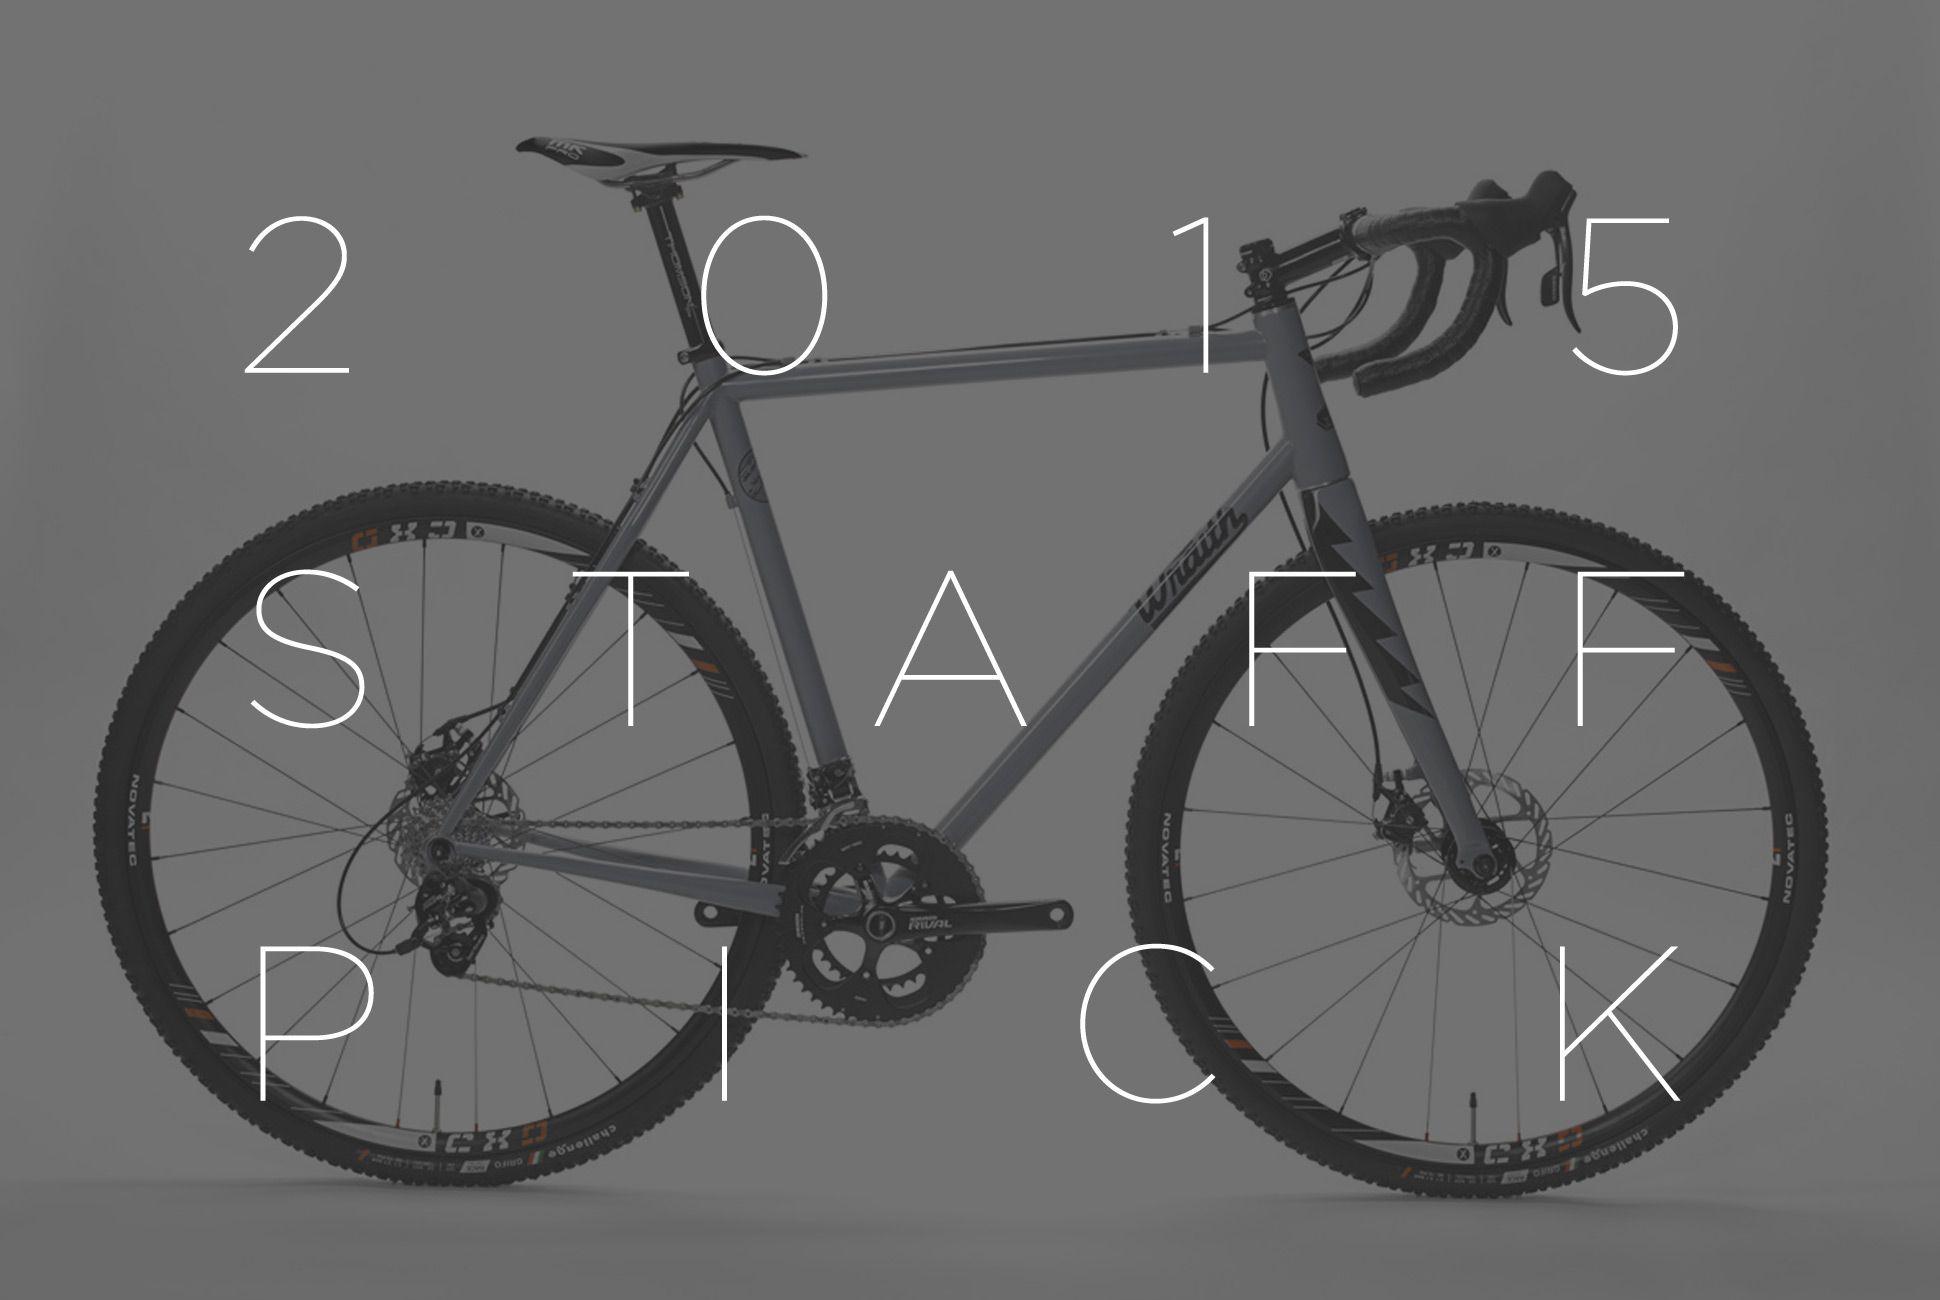 2015-Staff-Picks-Wrath-Bike-full-lead